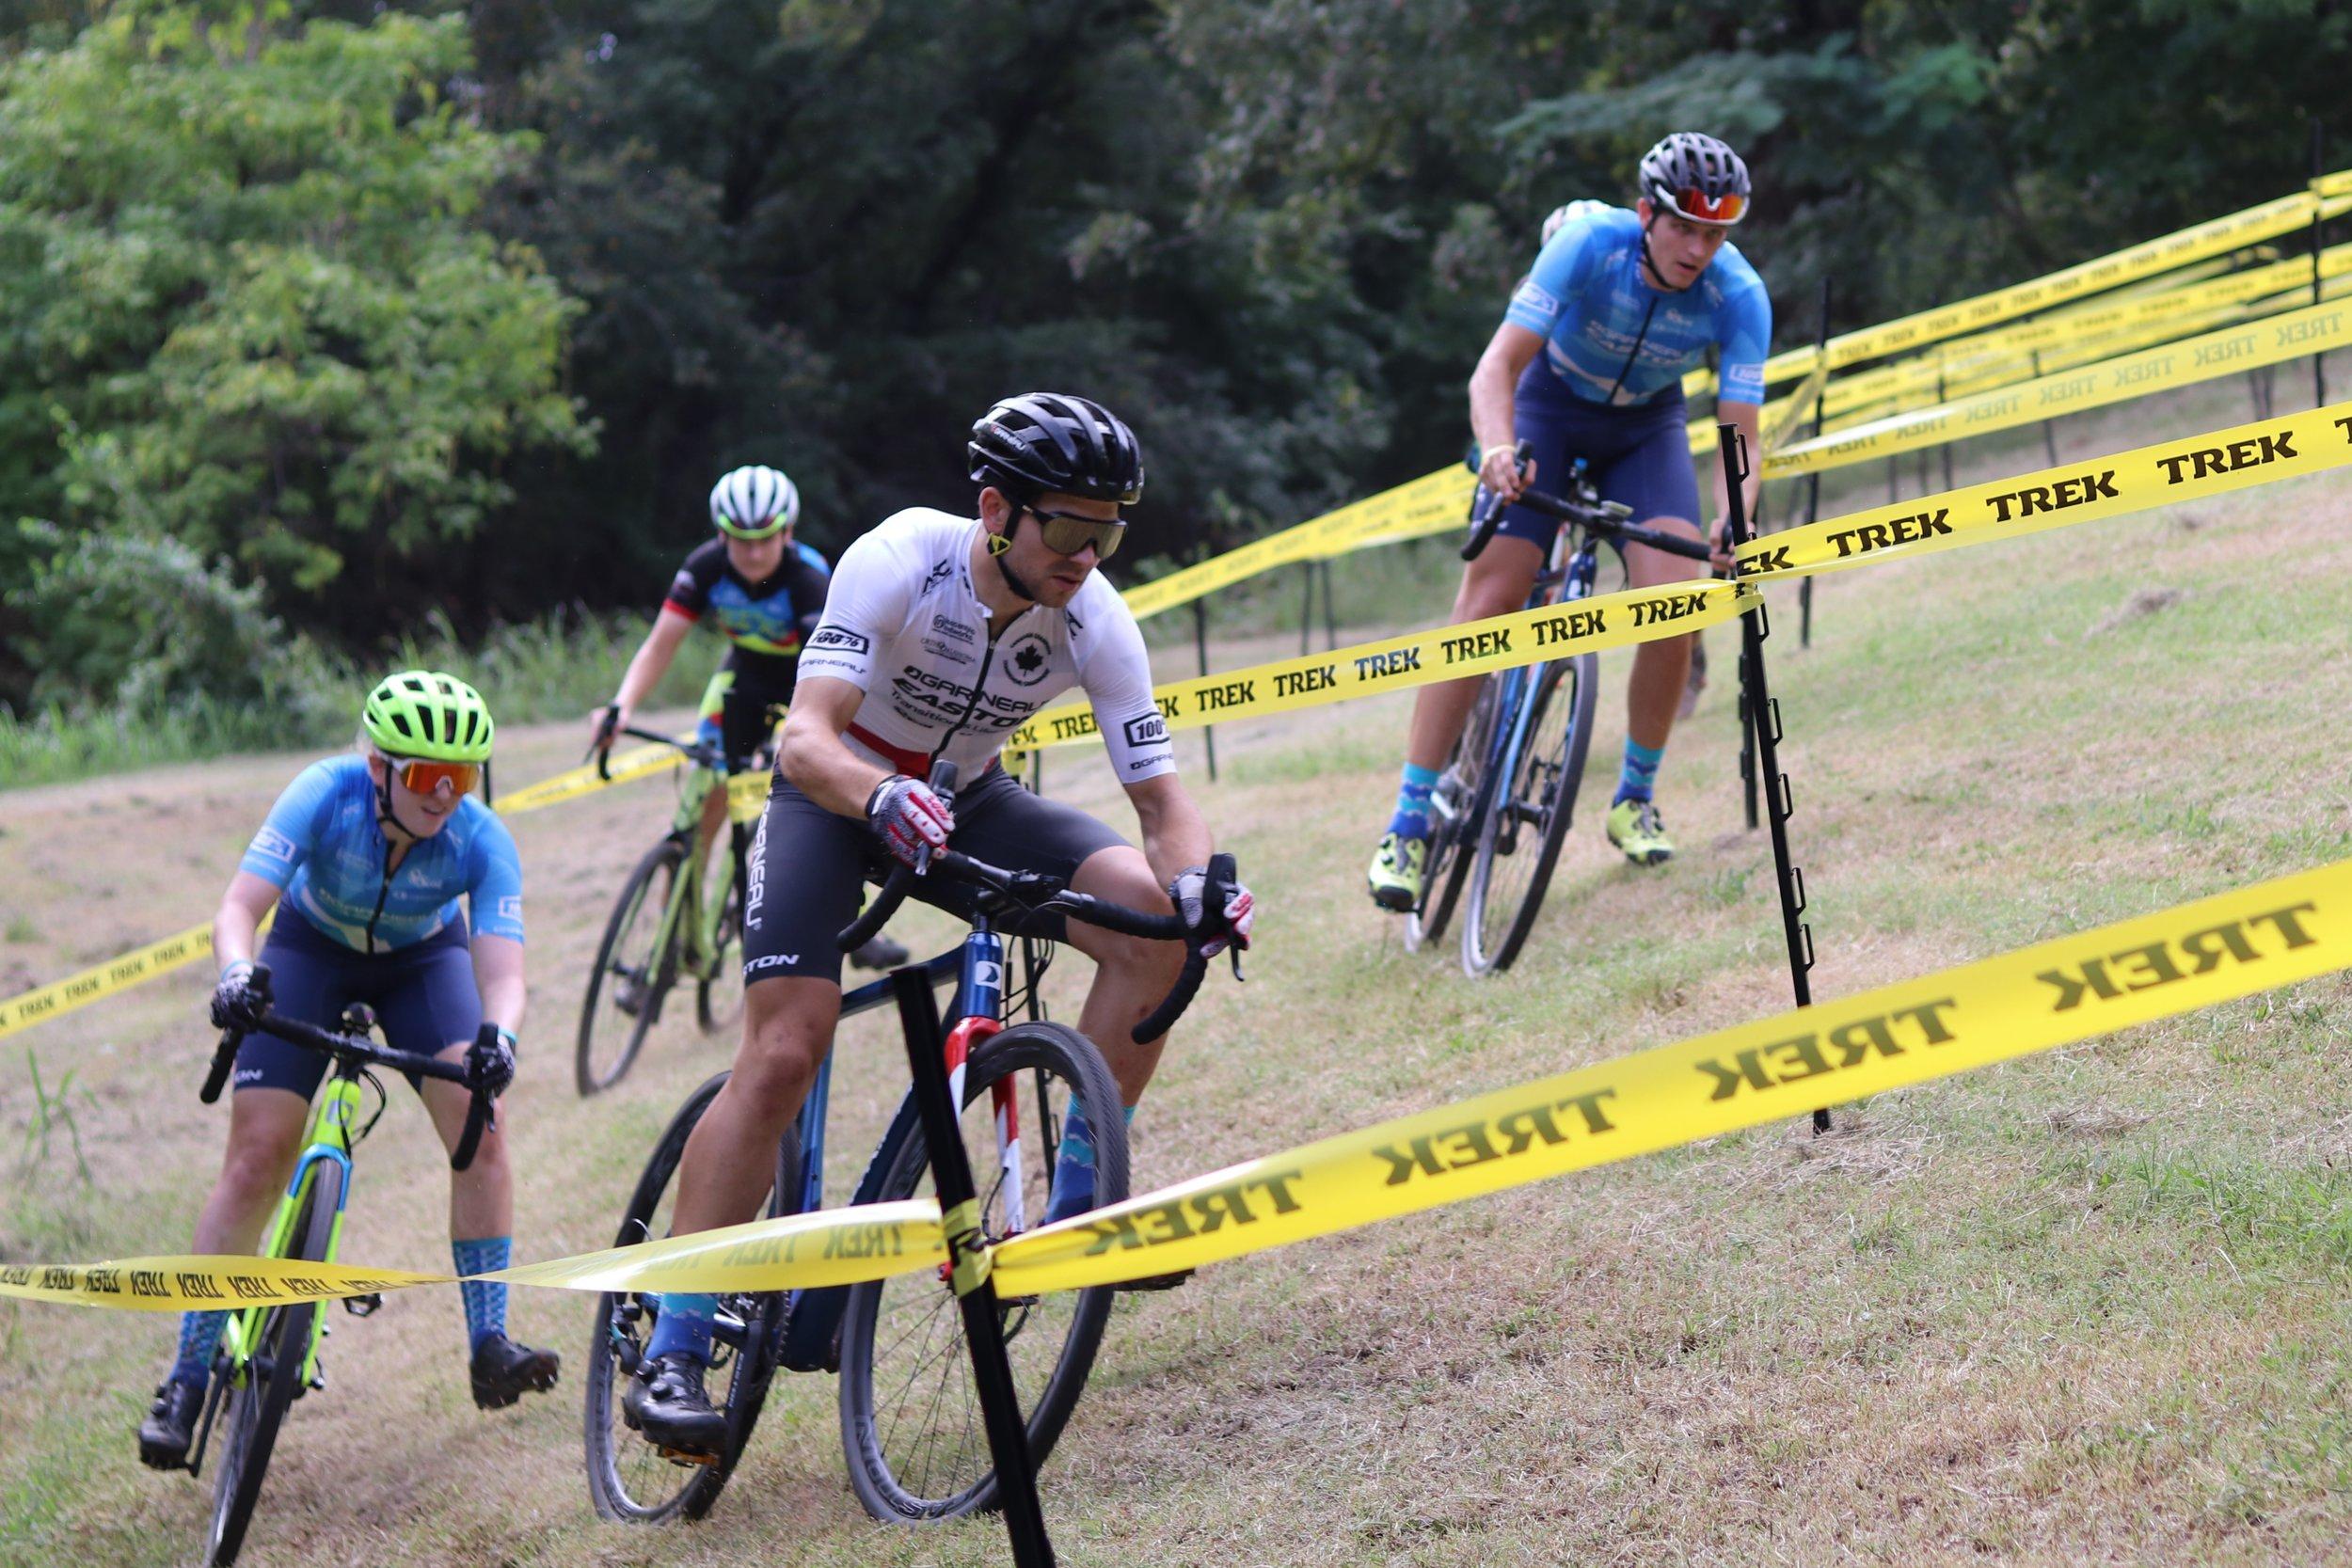 Michael van den Ham coaches at Cycle-Smart Oklahoma 'Cross Camp.